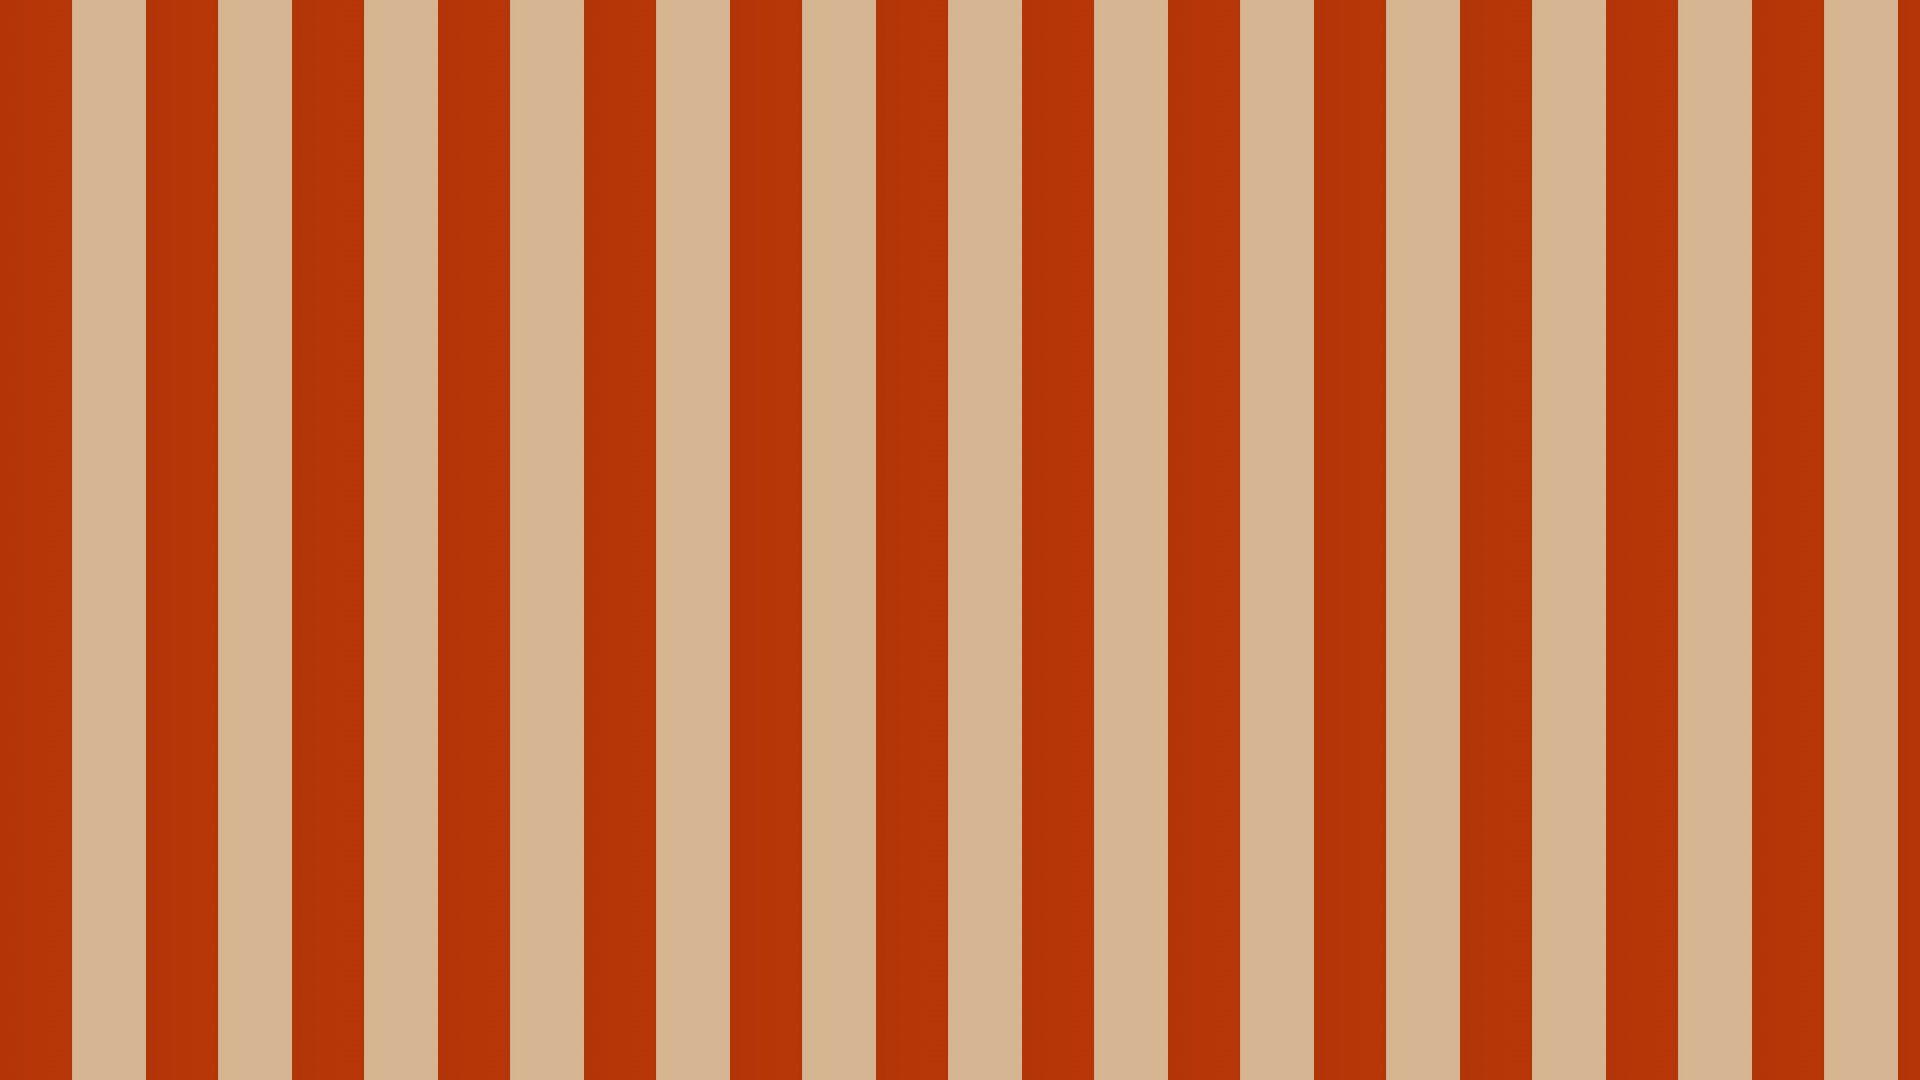 Circus Theme Wallpapers   Top Circus Theme Backgrounds 1920x1080